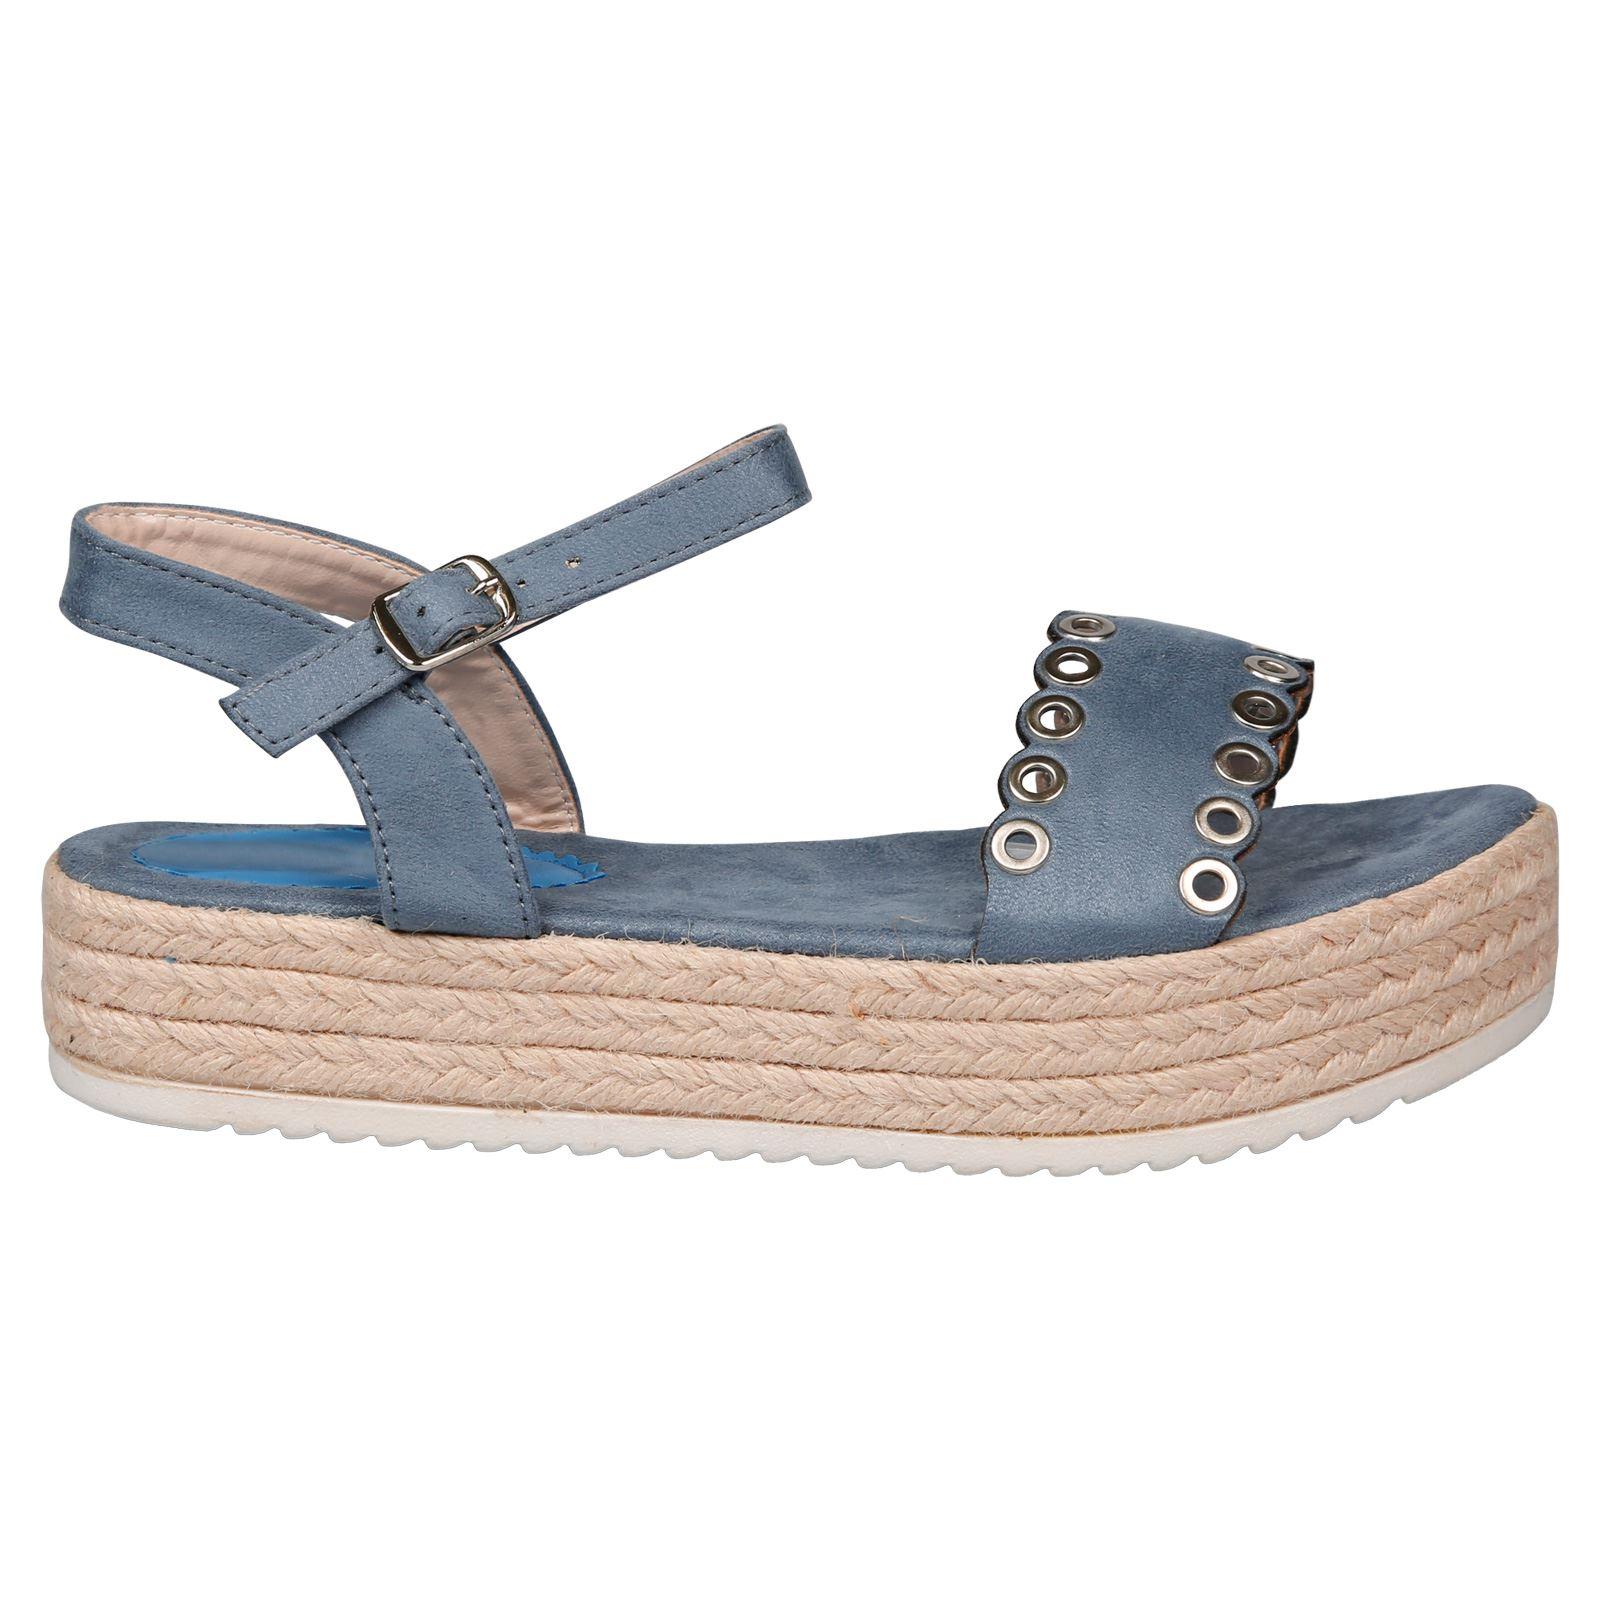 Perrie Womens Flat Low Heel Flatform Eyelet Espadrille Sandals Ladies Shoes Size